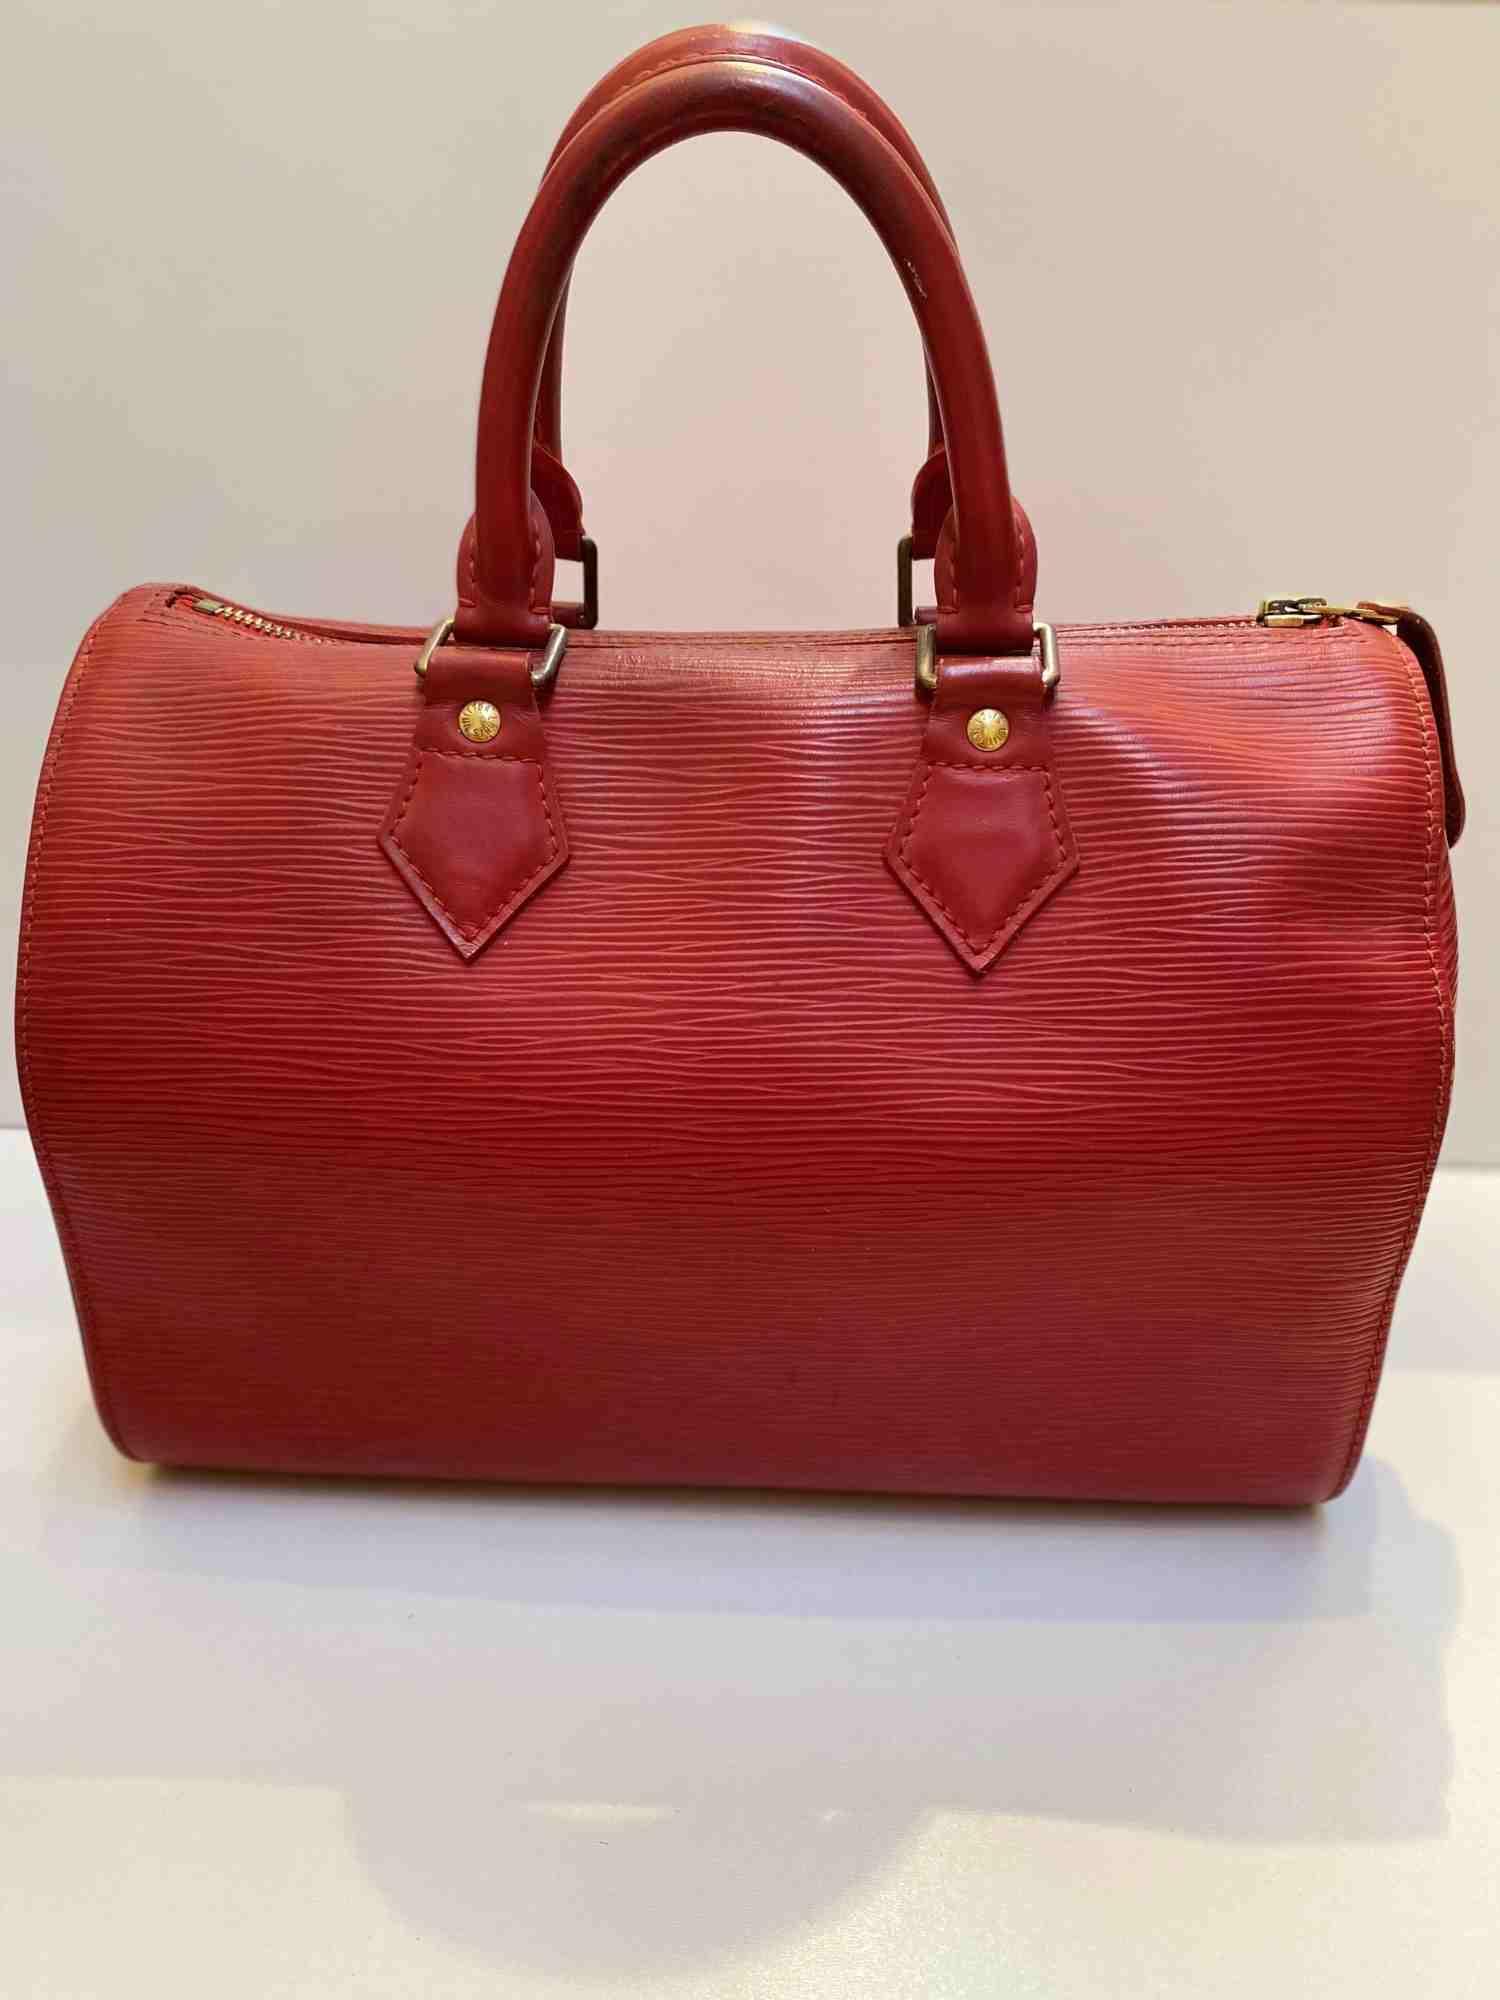 Bolsa Louis Vuitton Speedy 25 EPI Vermelha